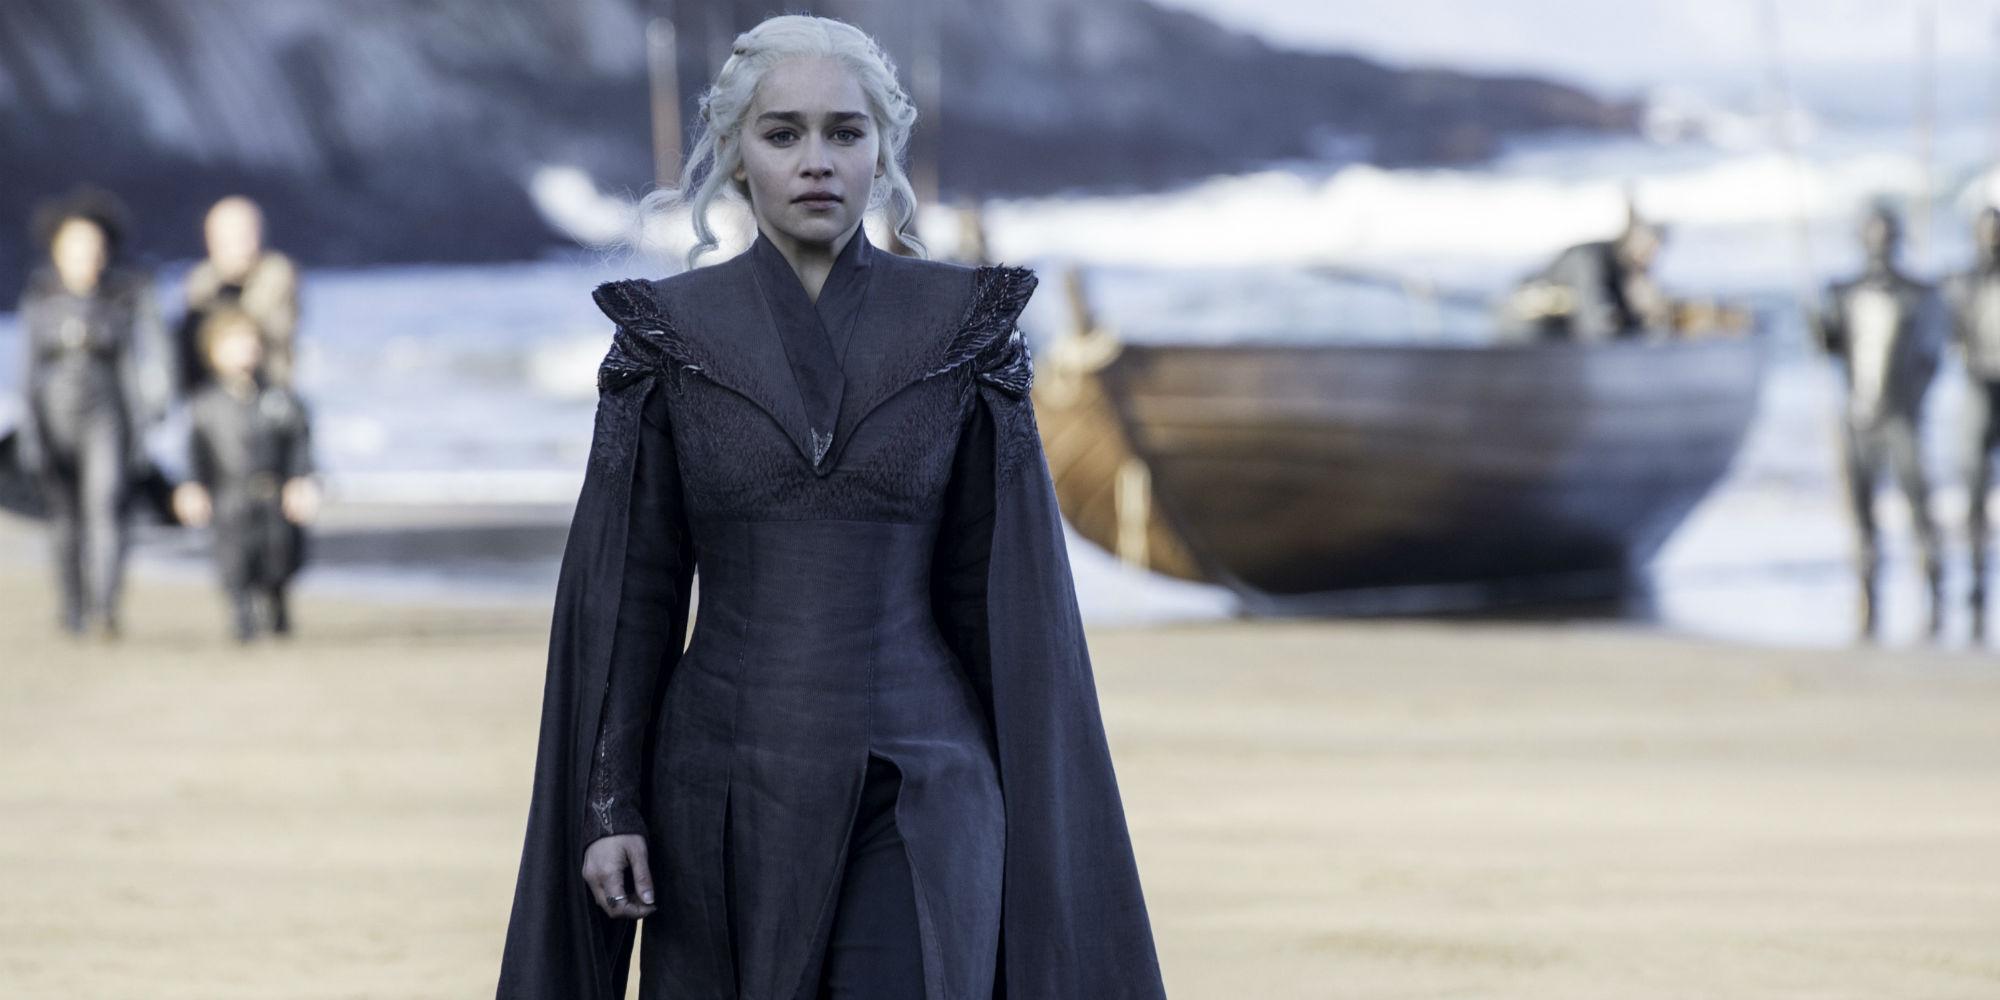 Emilia Clarke as Daenerys Targaryen in Game of Thrones season 7